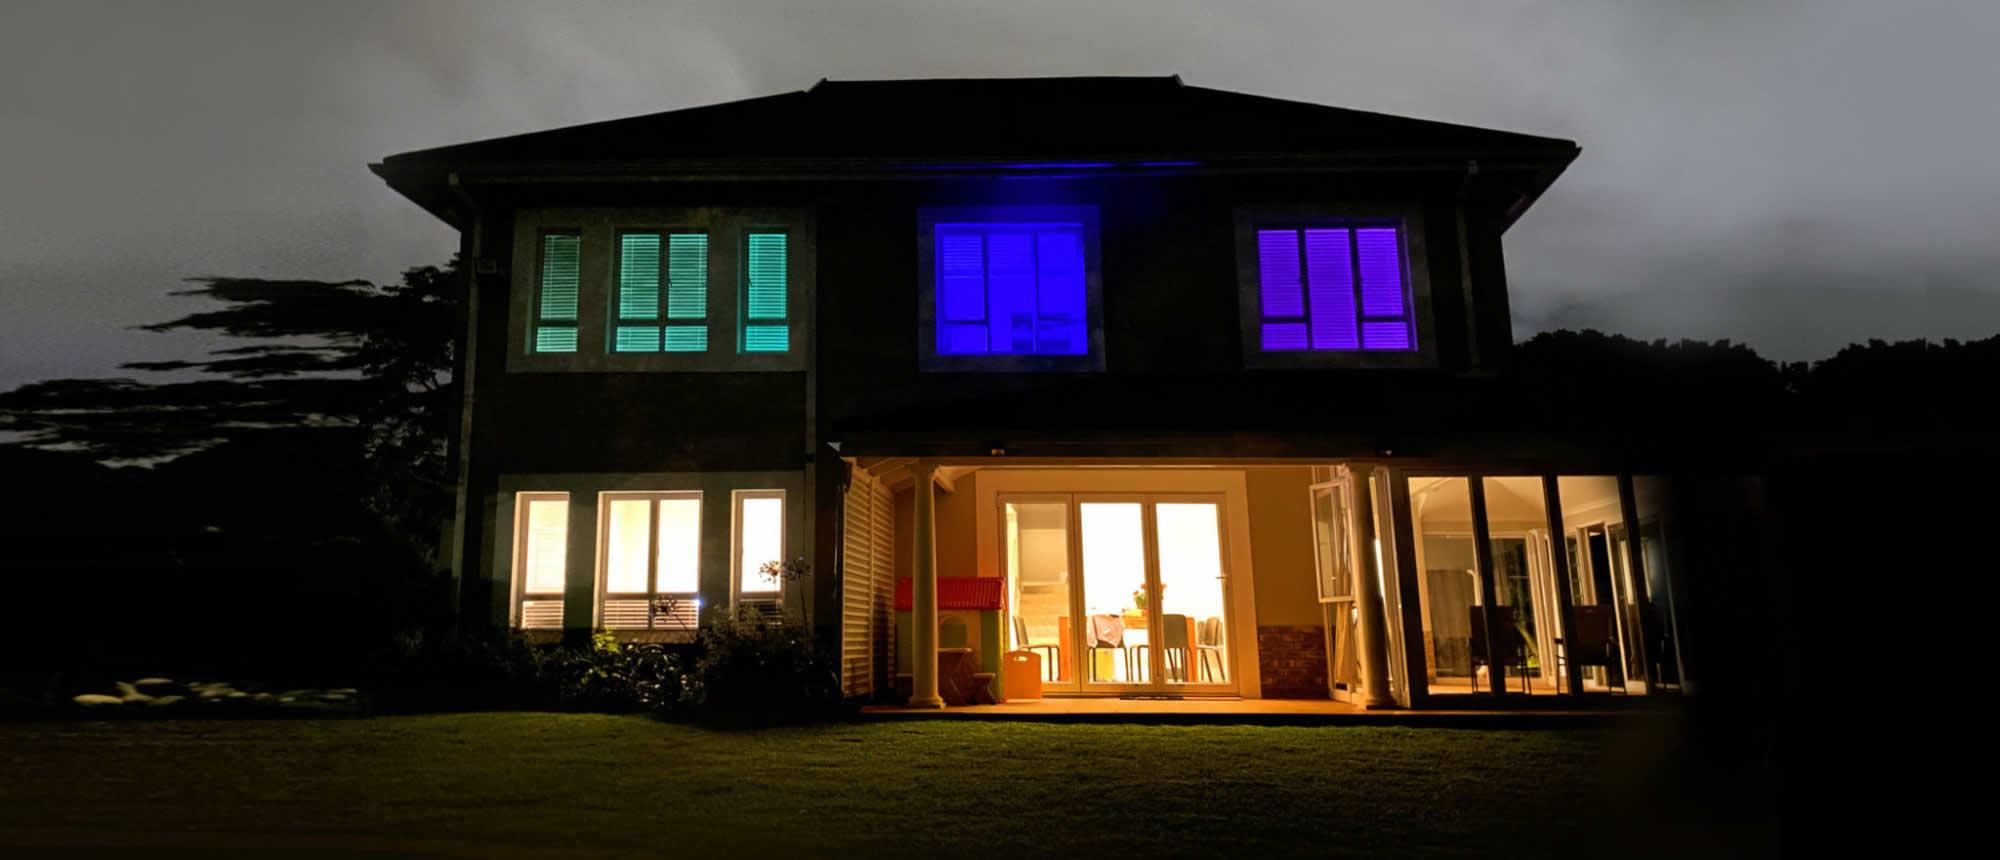 Light up your life with RGB Lighting this festive season